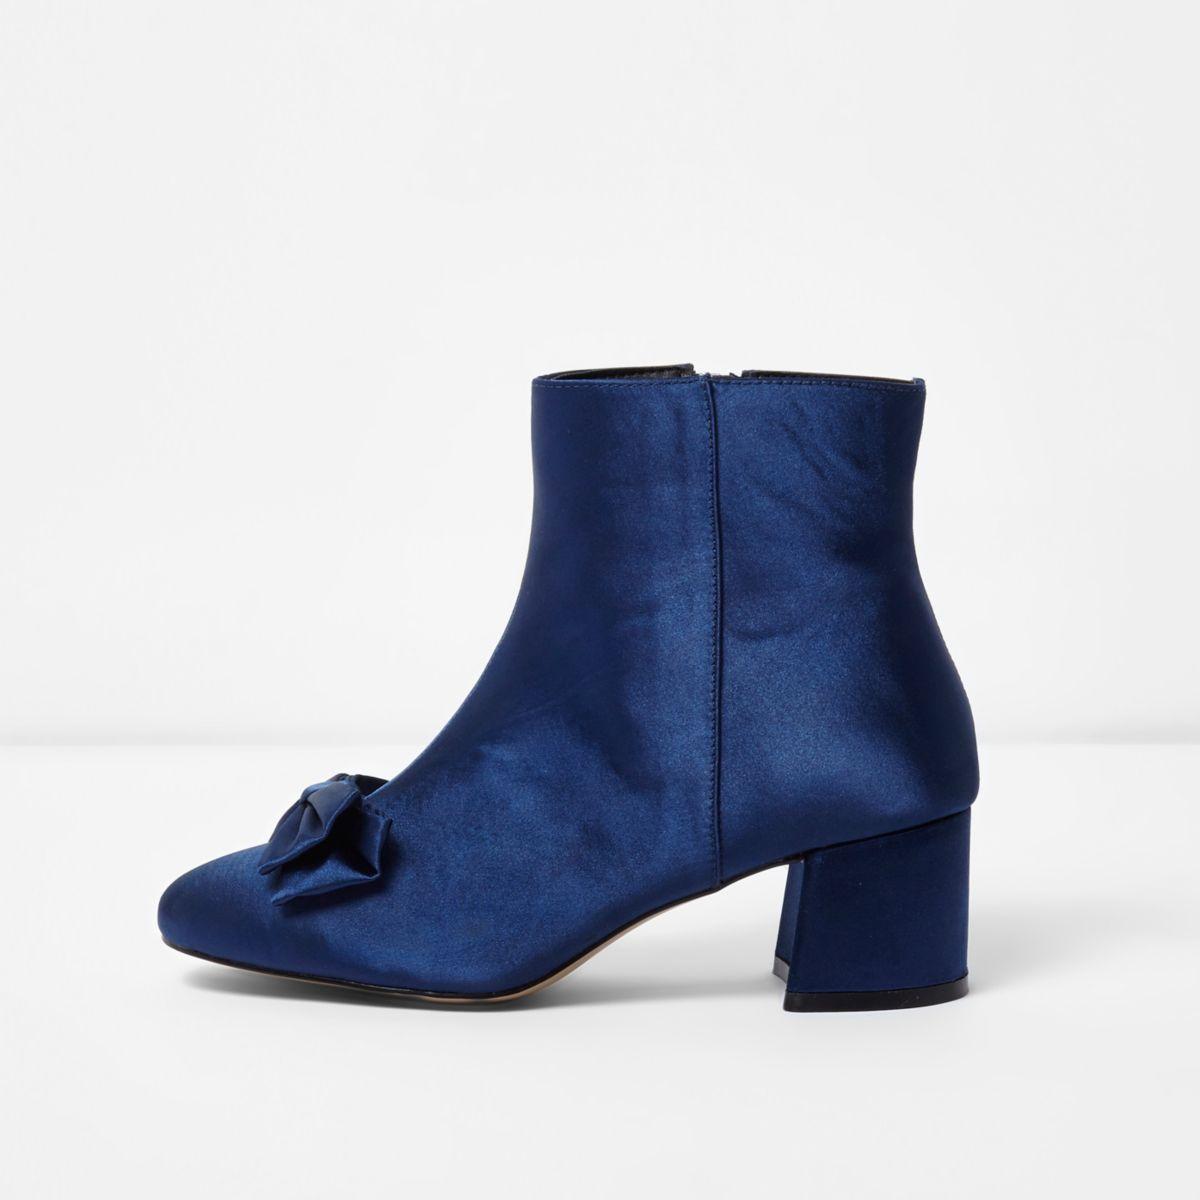 Dark blue bow satin block heel ankle boots